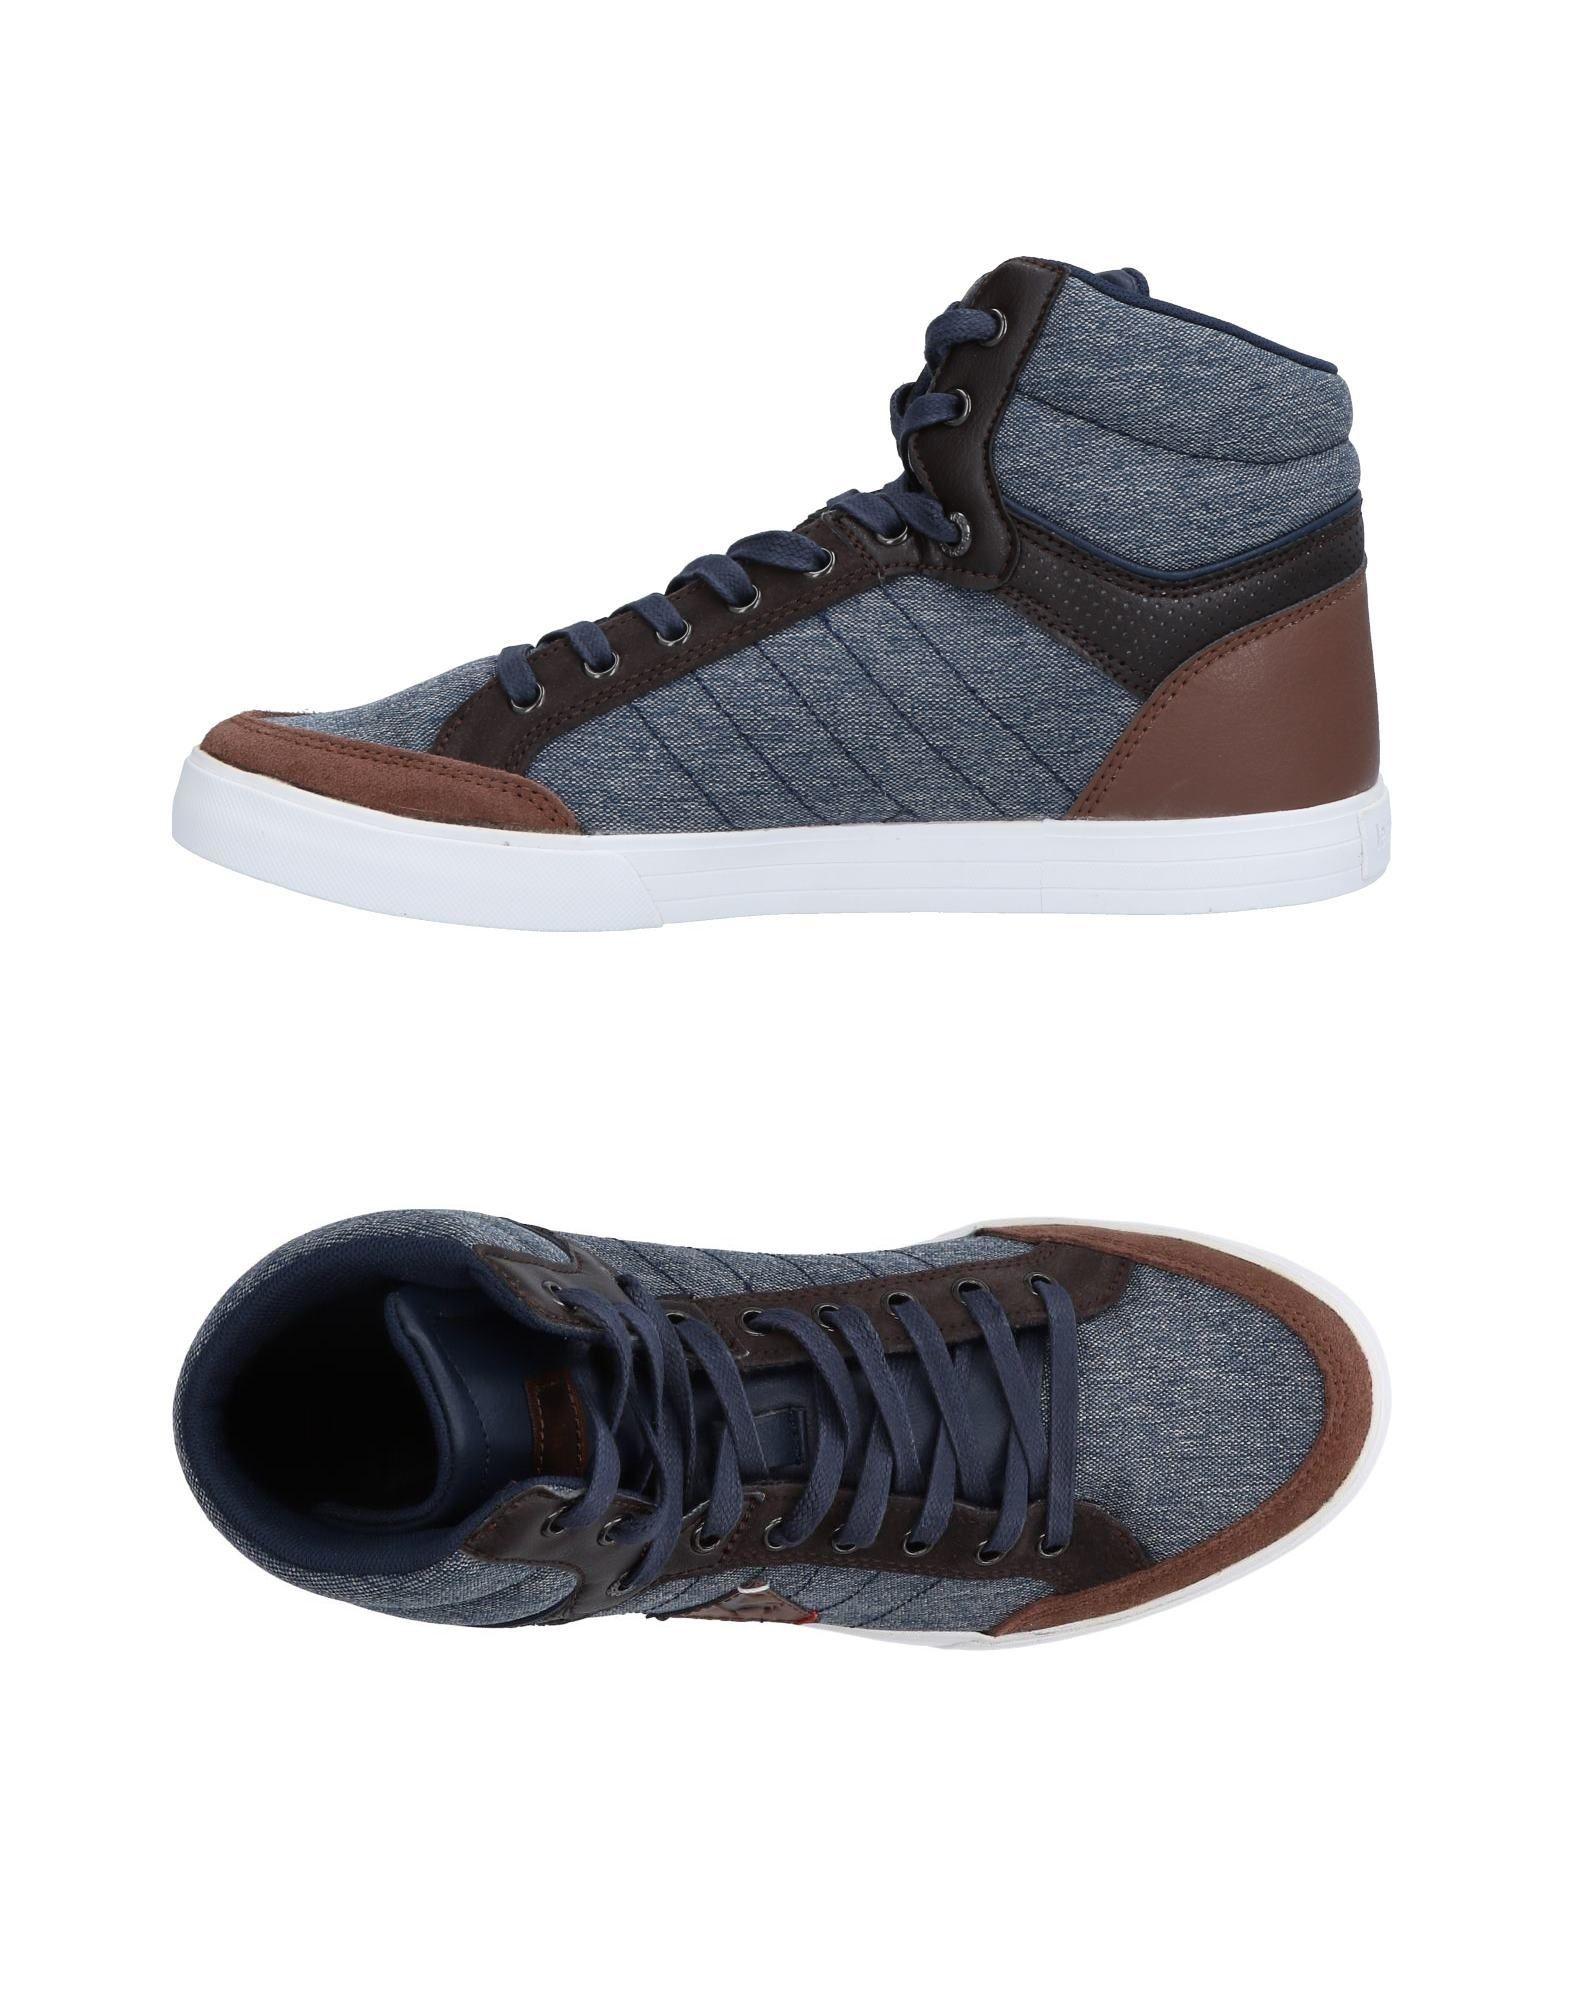 LE COQ SPORTIF Высокие кеды и кроссовки кеды кроссовки высокие женские dc evan hi le brown dark chocolate